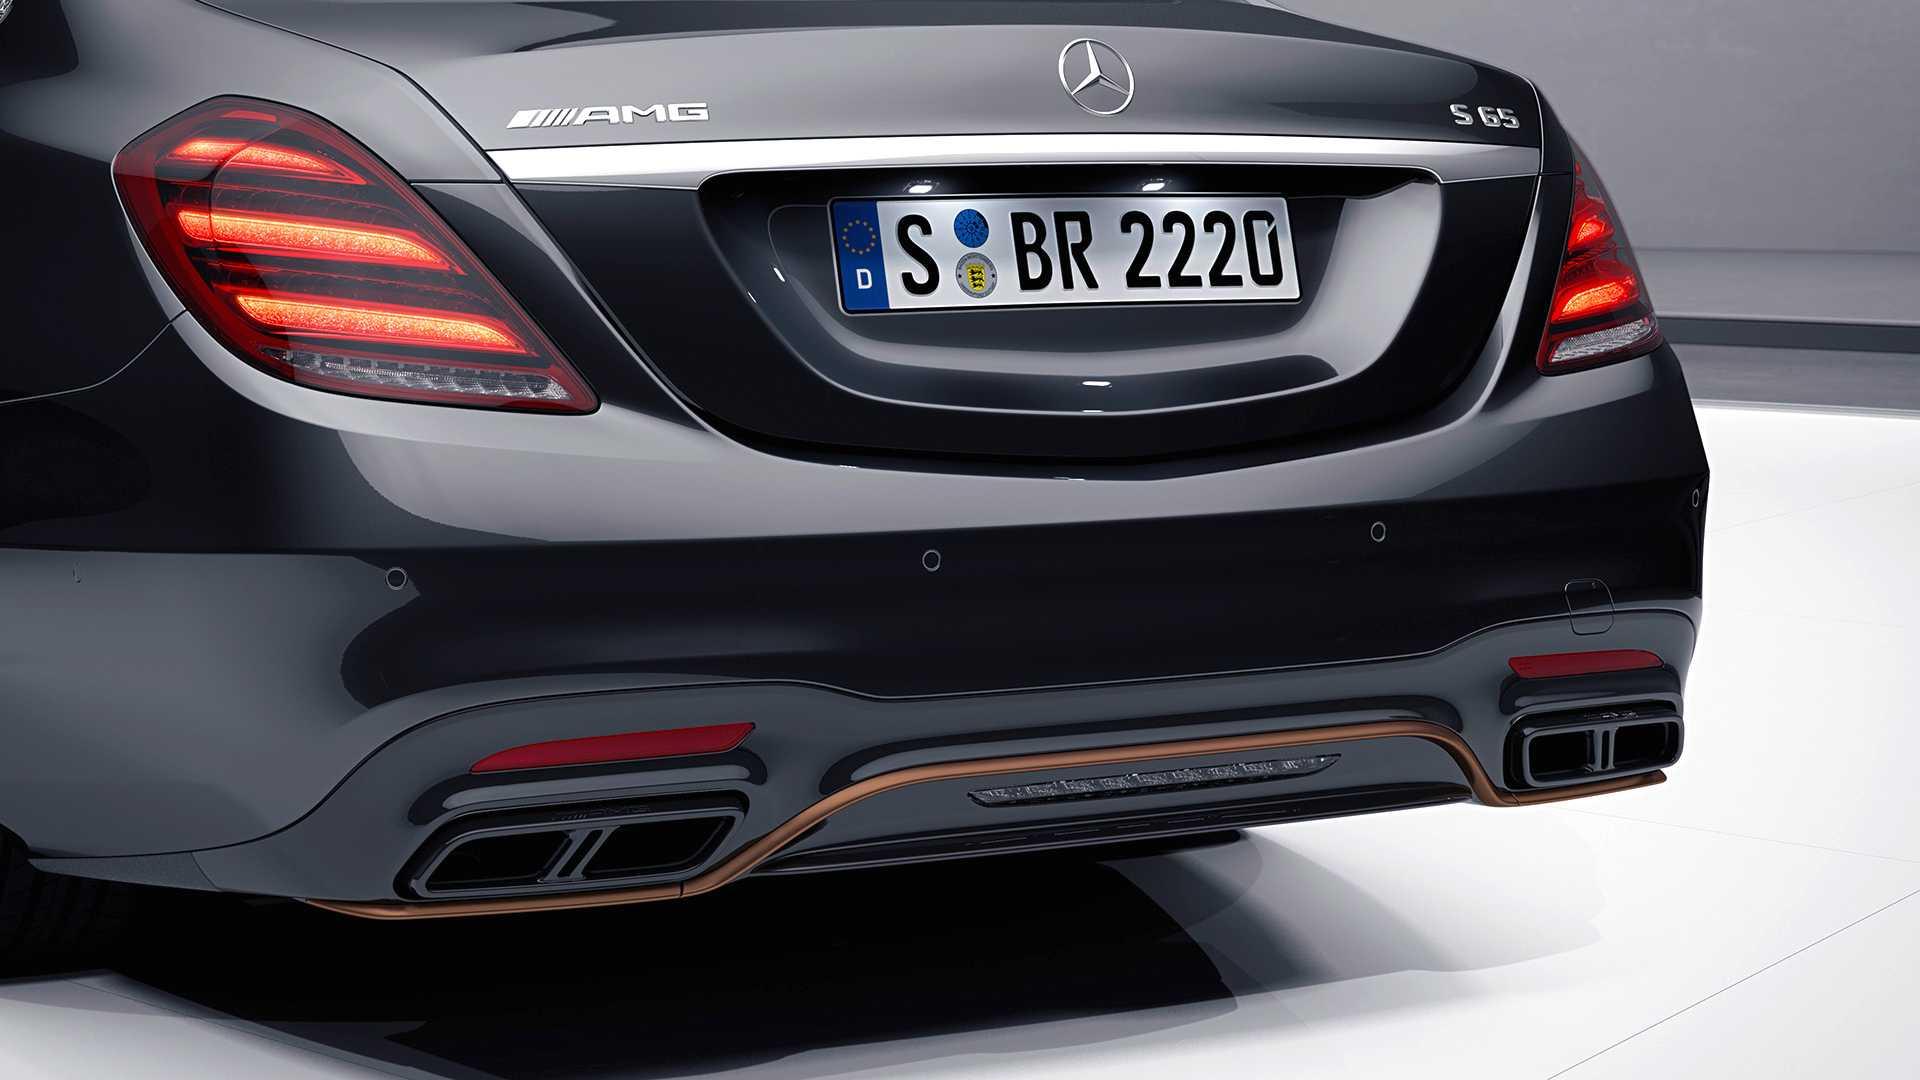 Mercedes-Benz S65 AMG Final Edition